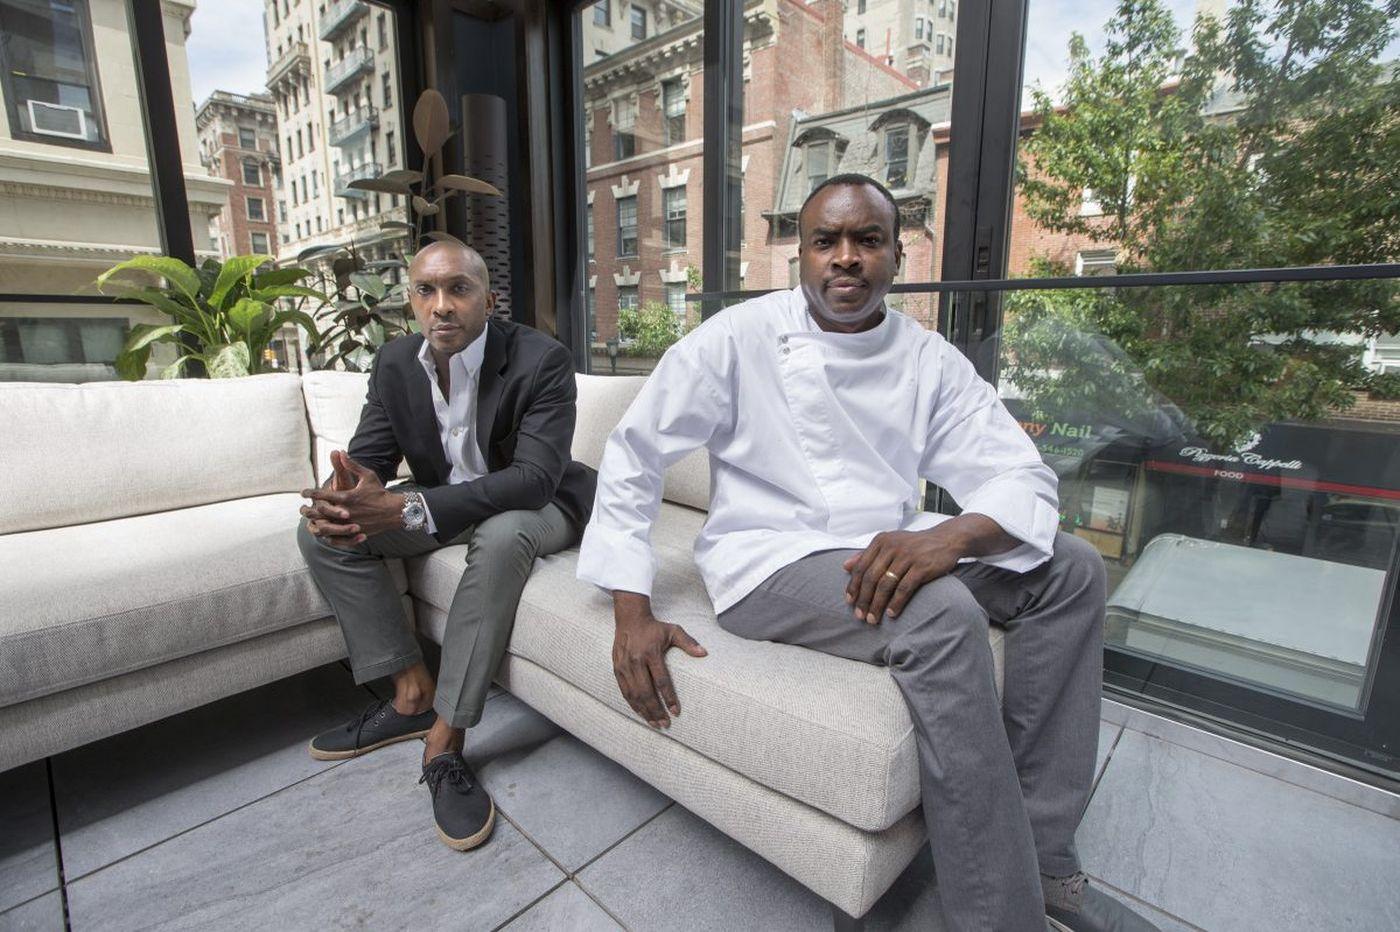 Chef Sylva Senat leaves Maison 208 in Center City